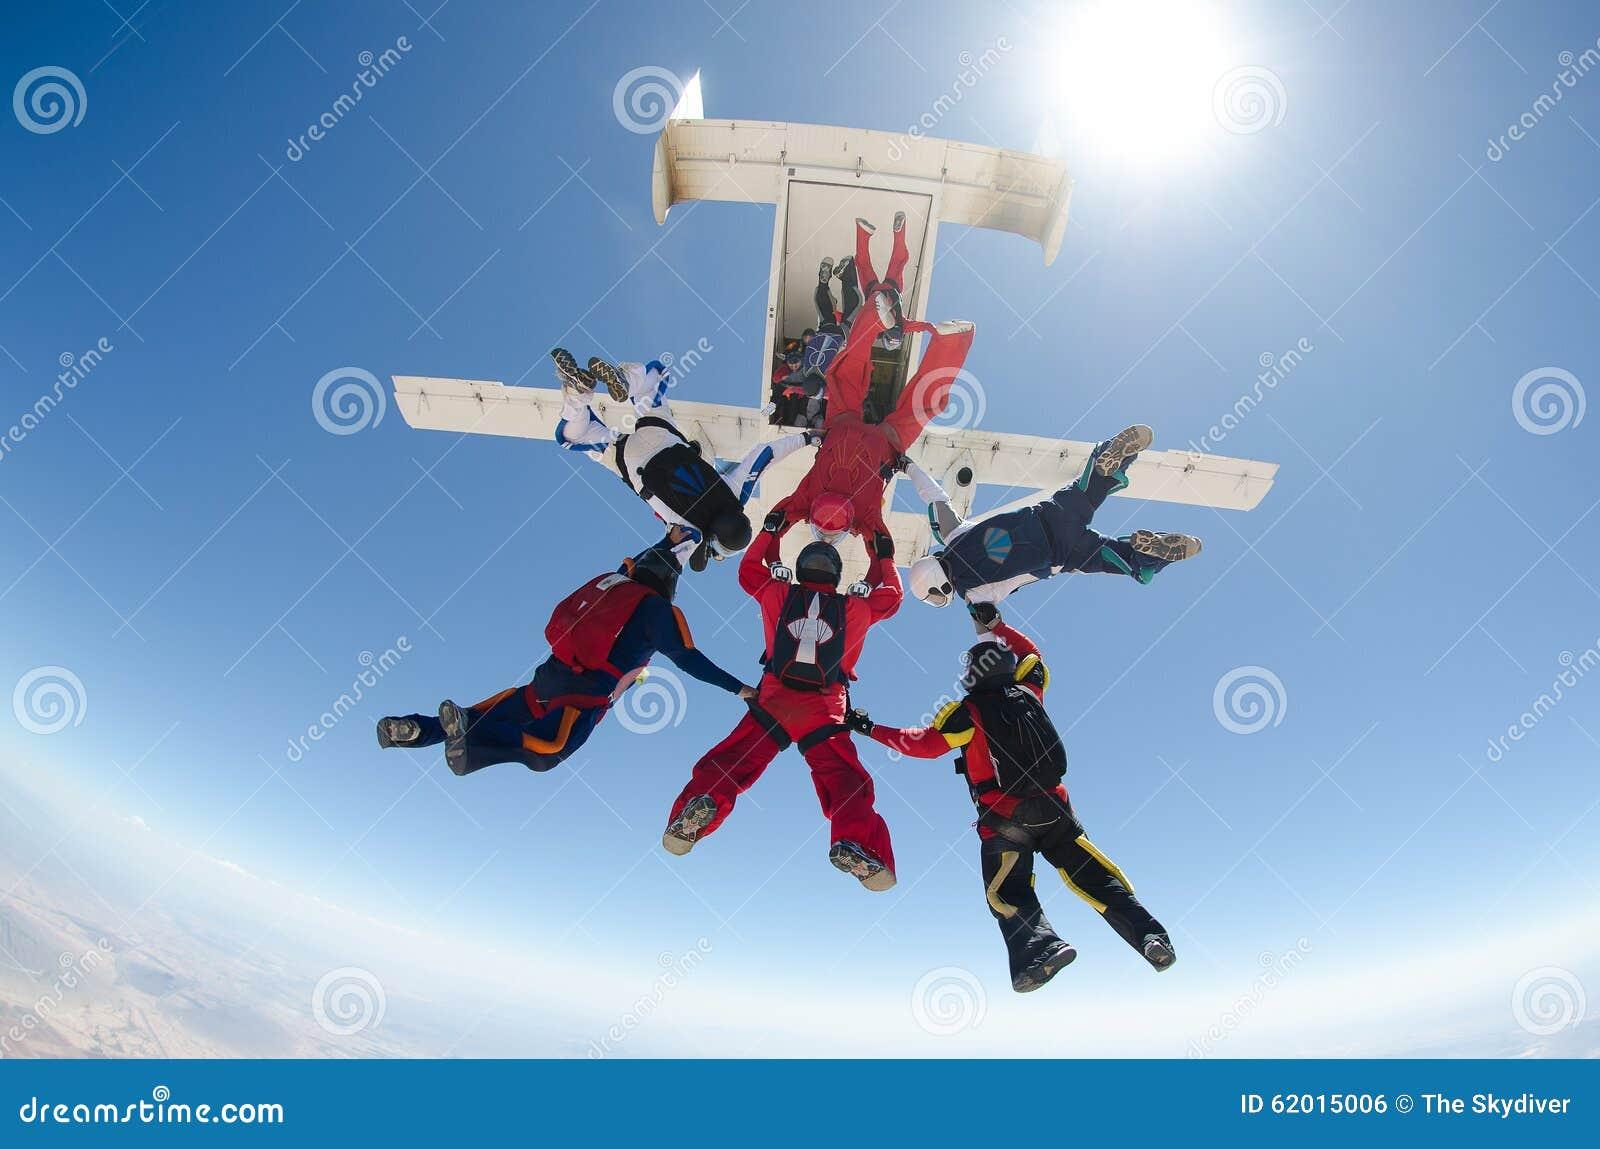 Skydiving人从飞机跳